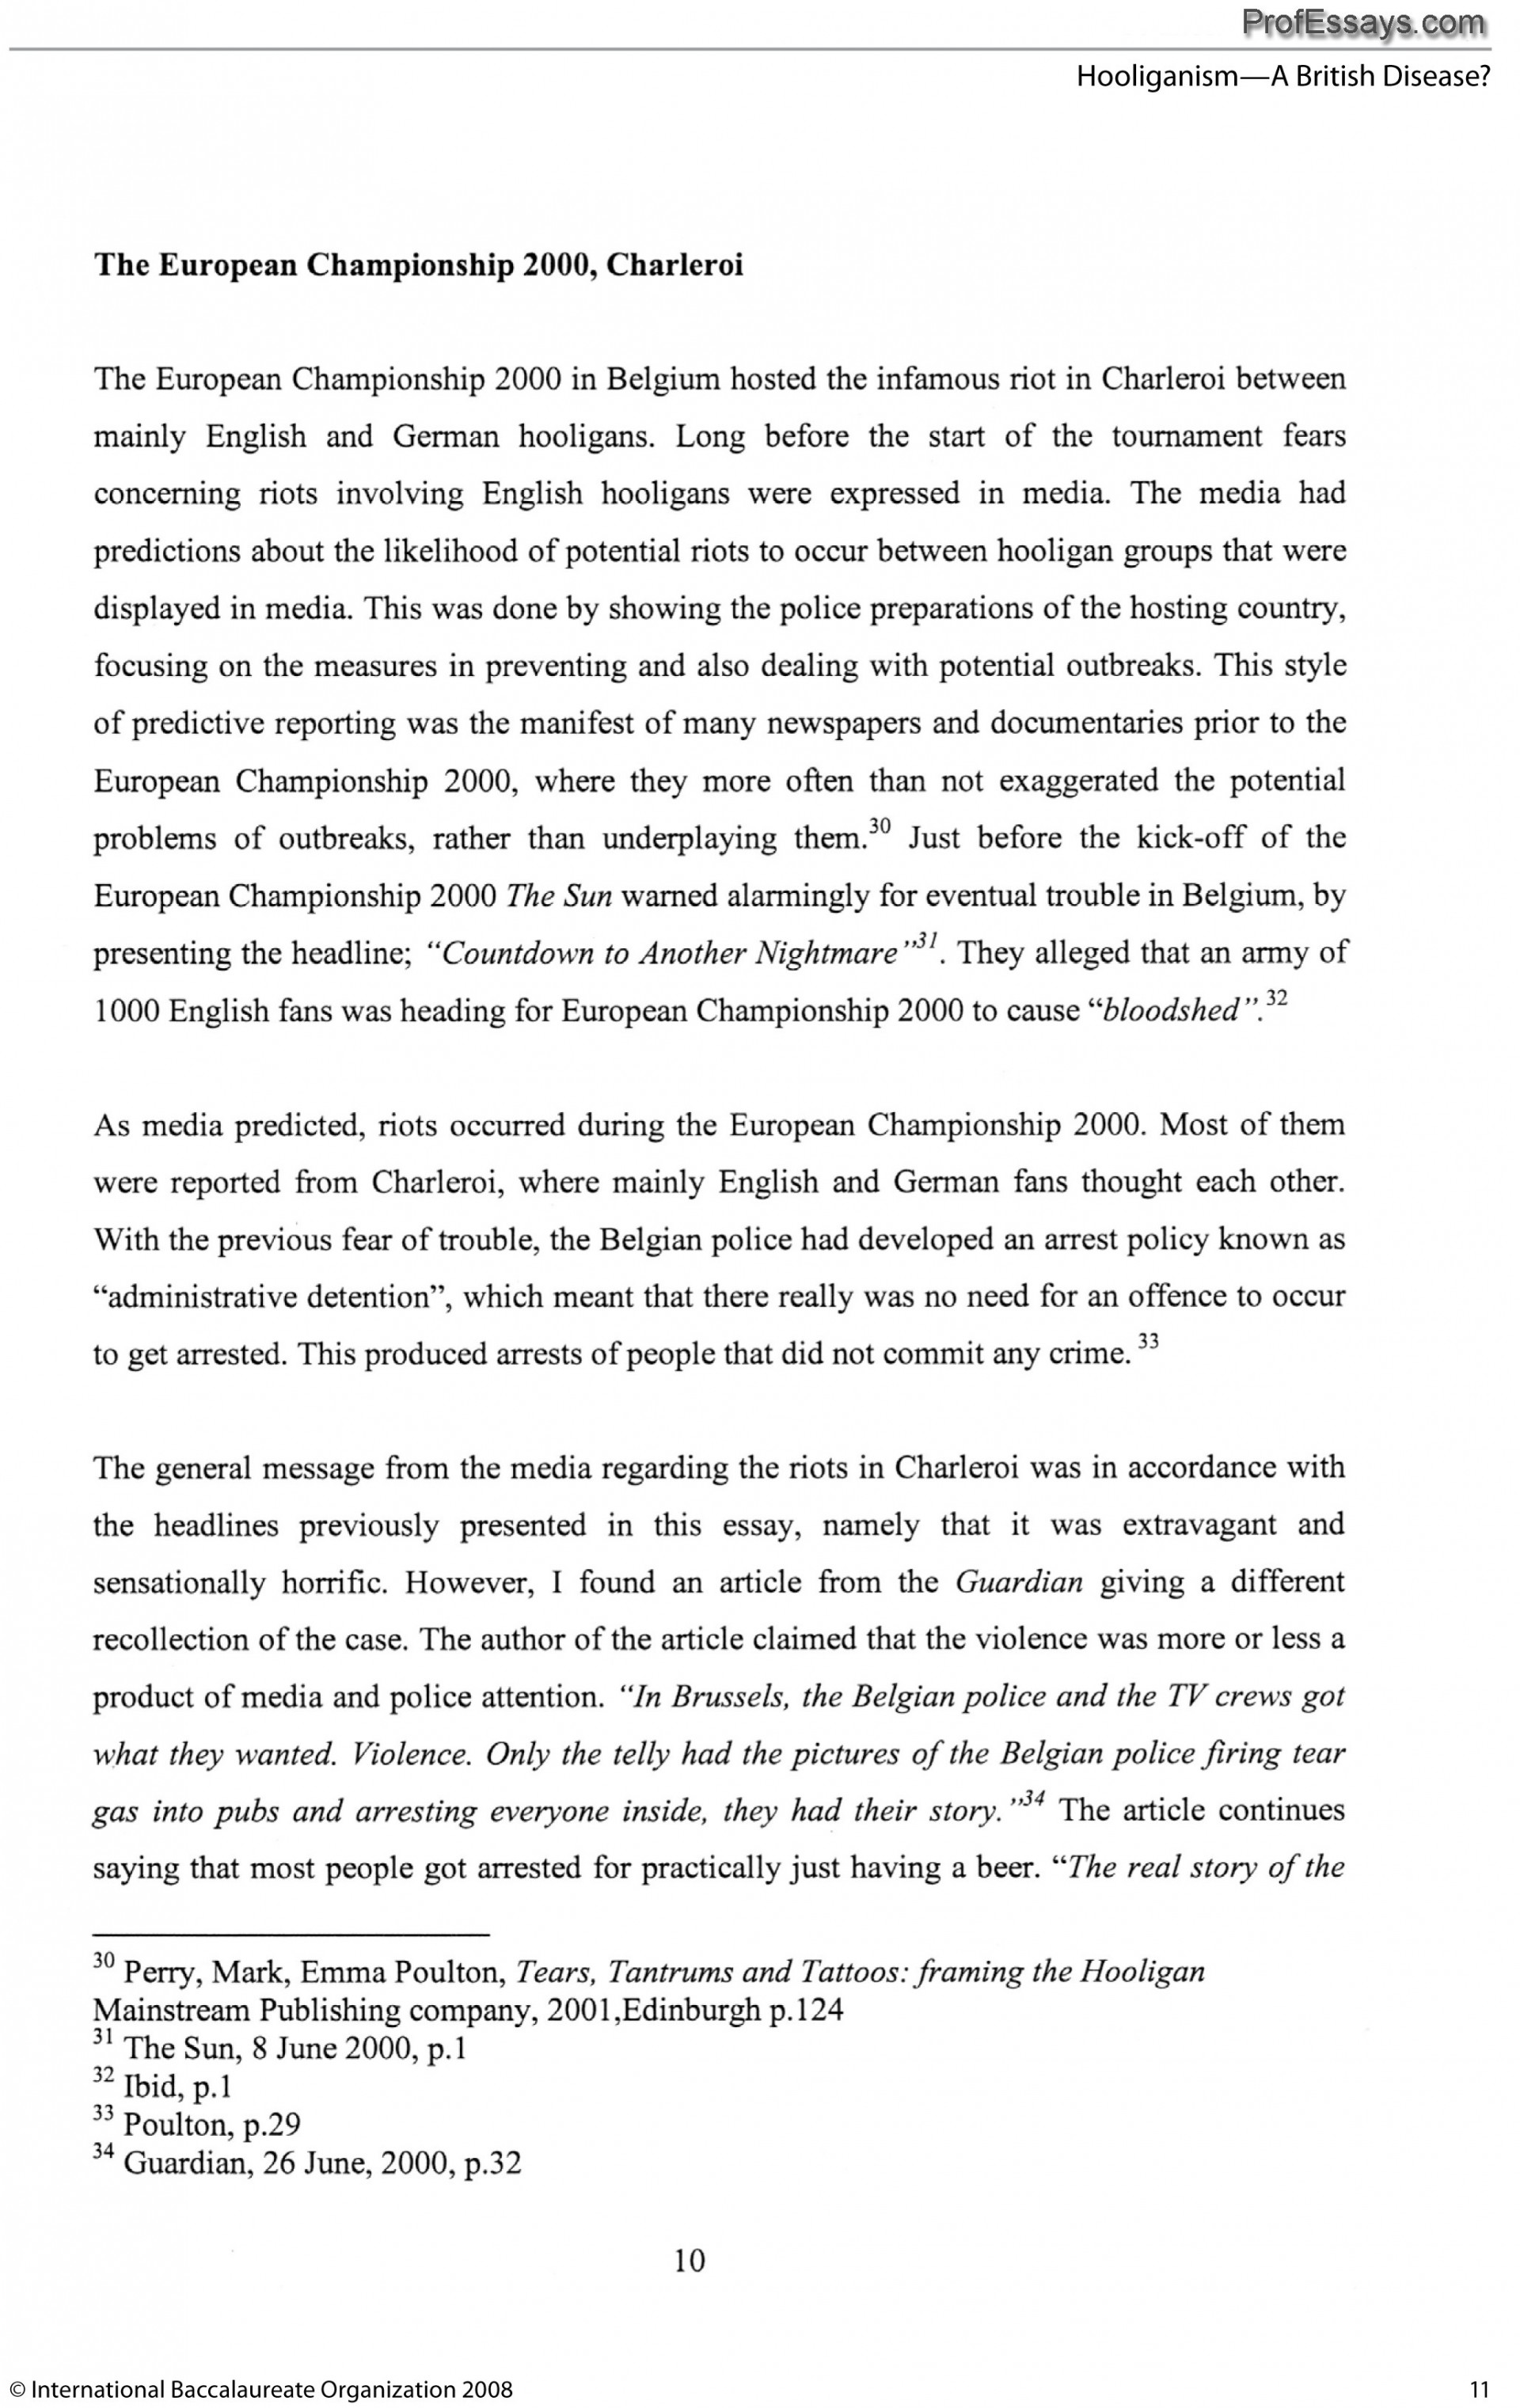 009 Ib Extended Essay Free Sample Example English Writing Striking Essays Creative 1920